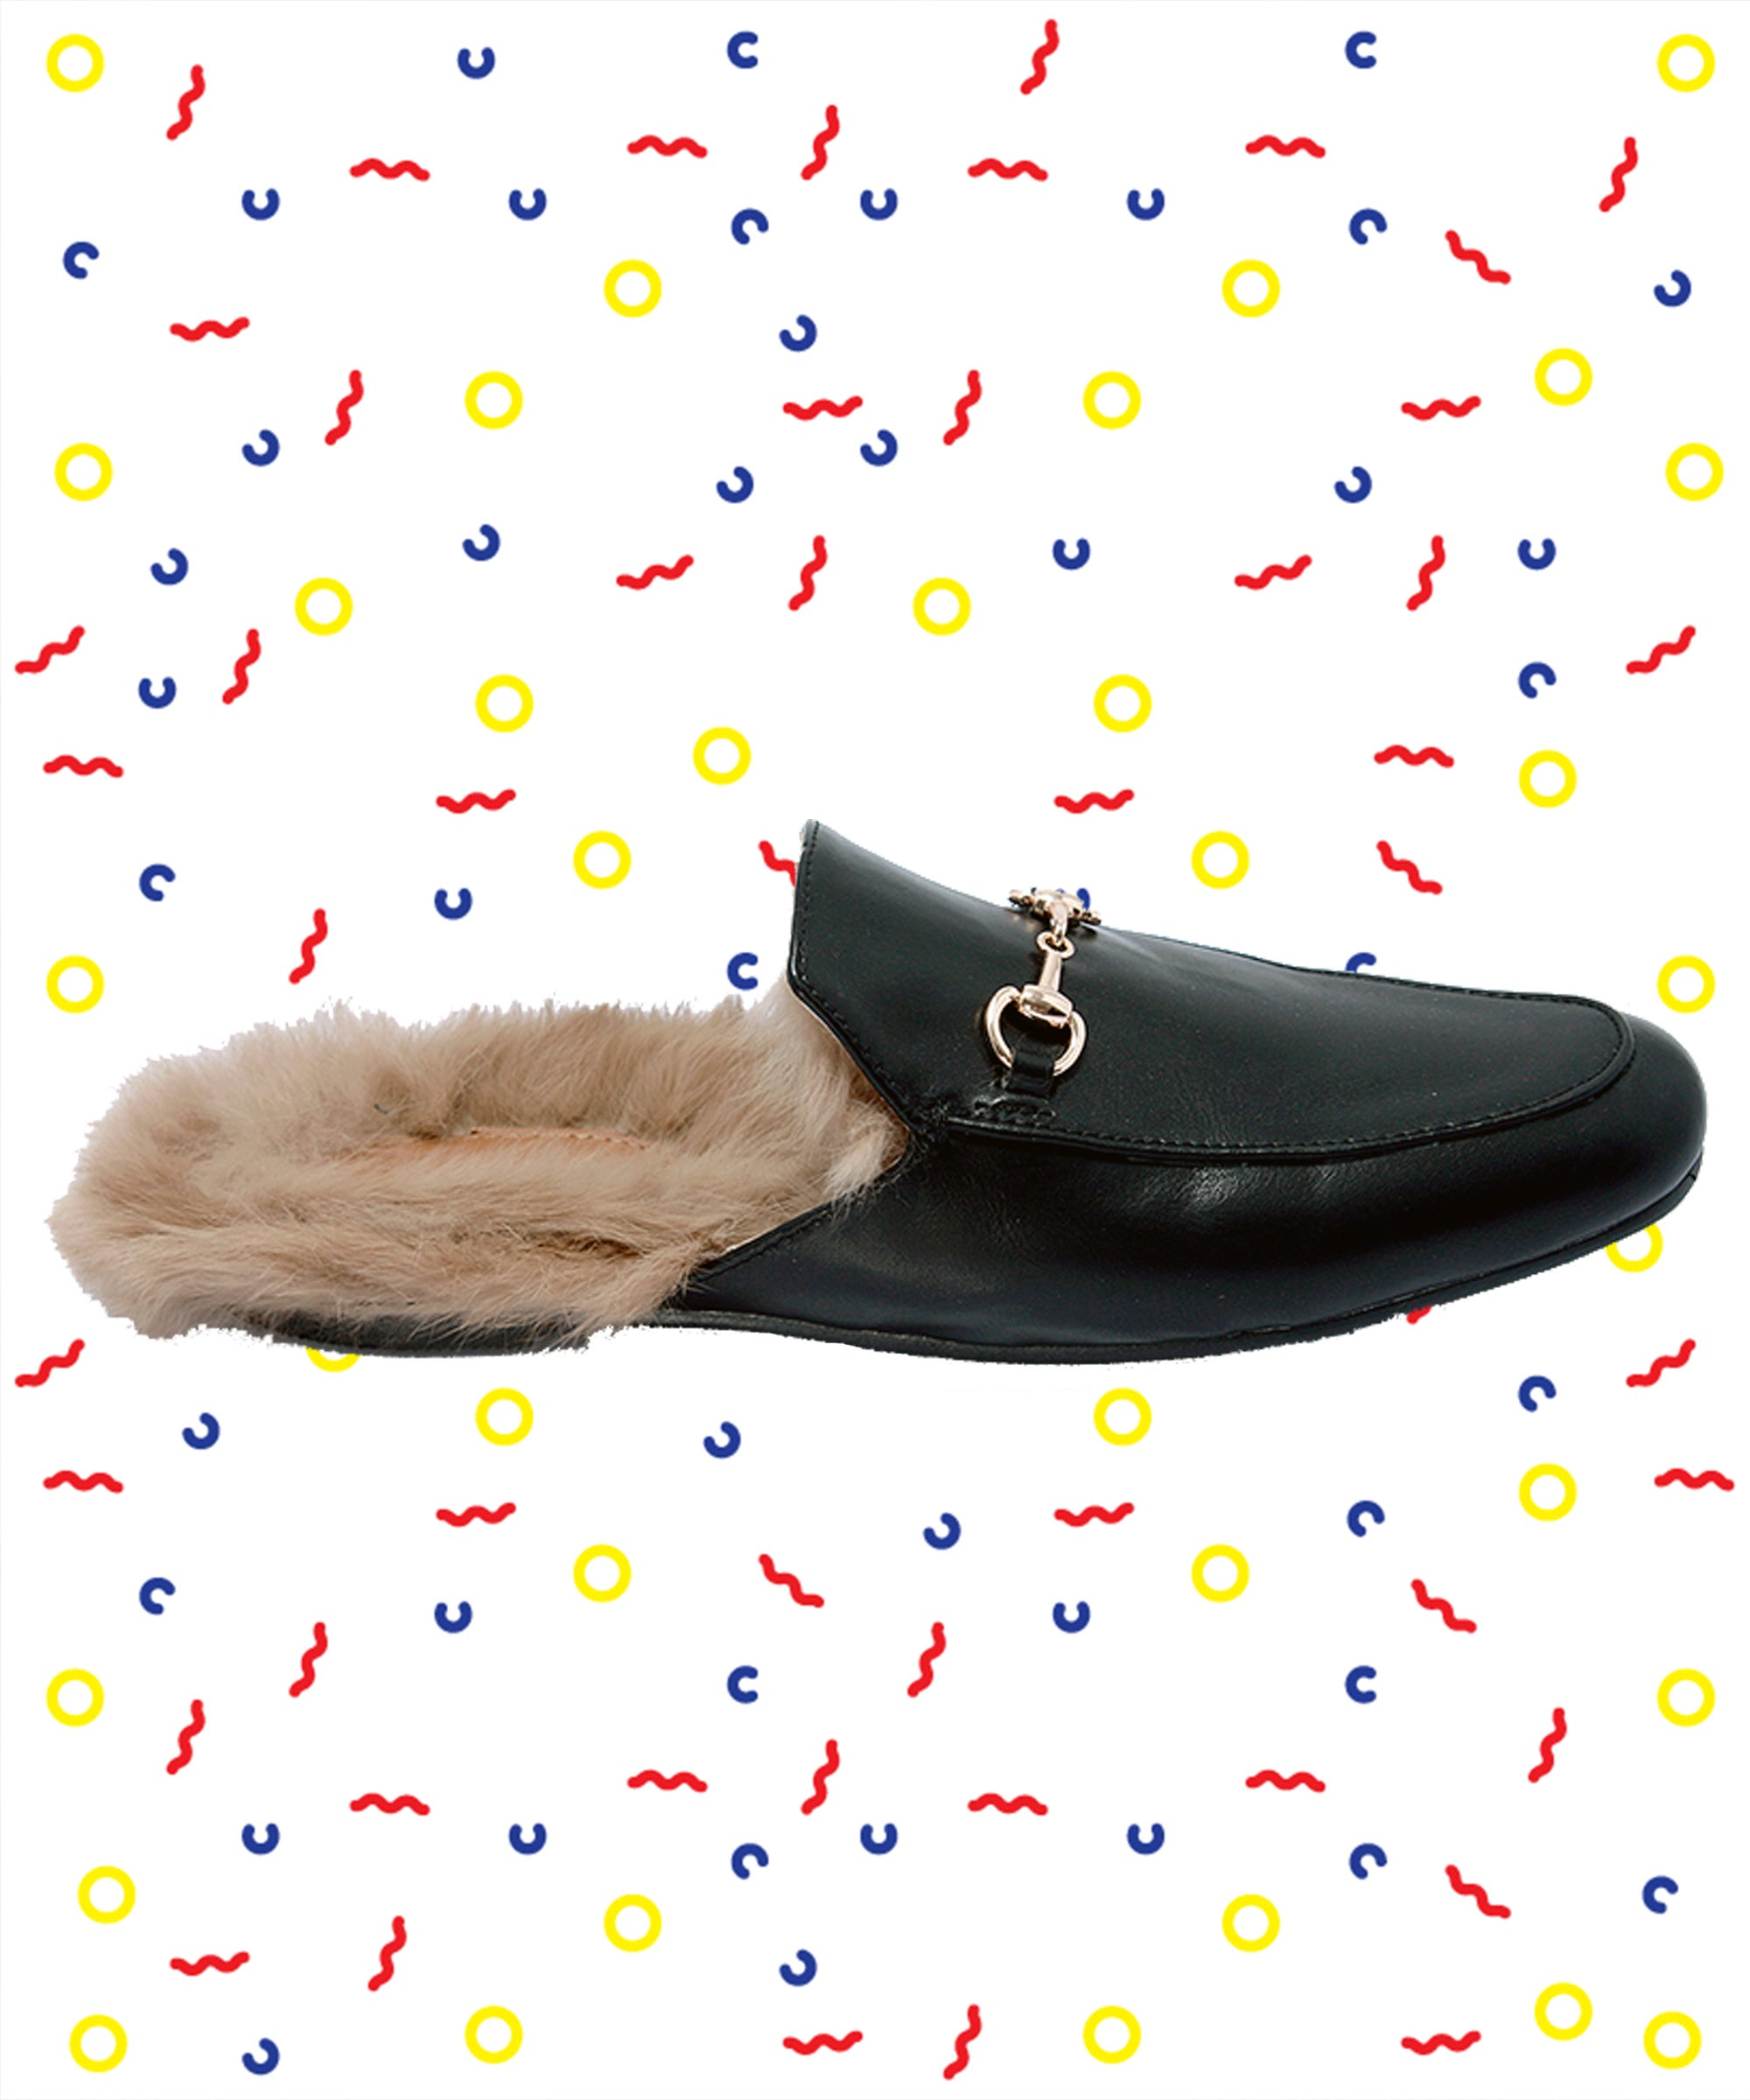 486b99a71e3 Gucci Fur Slipper Knockoff Loeil Shoes